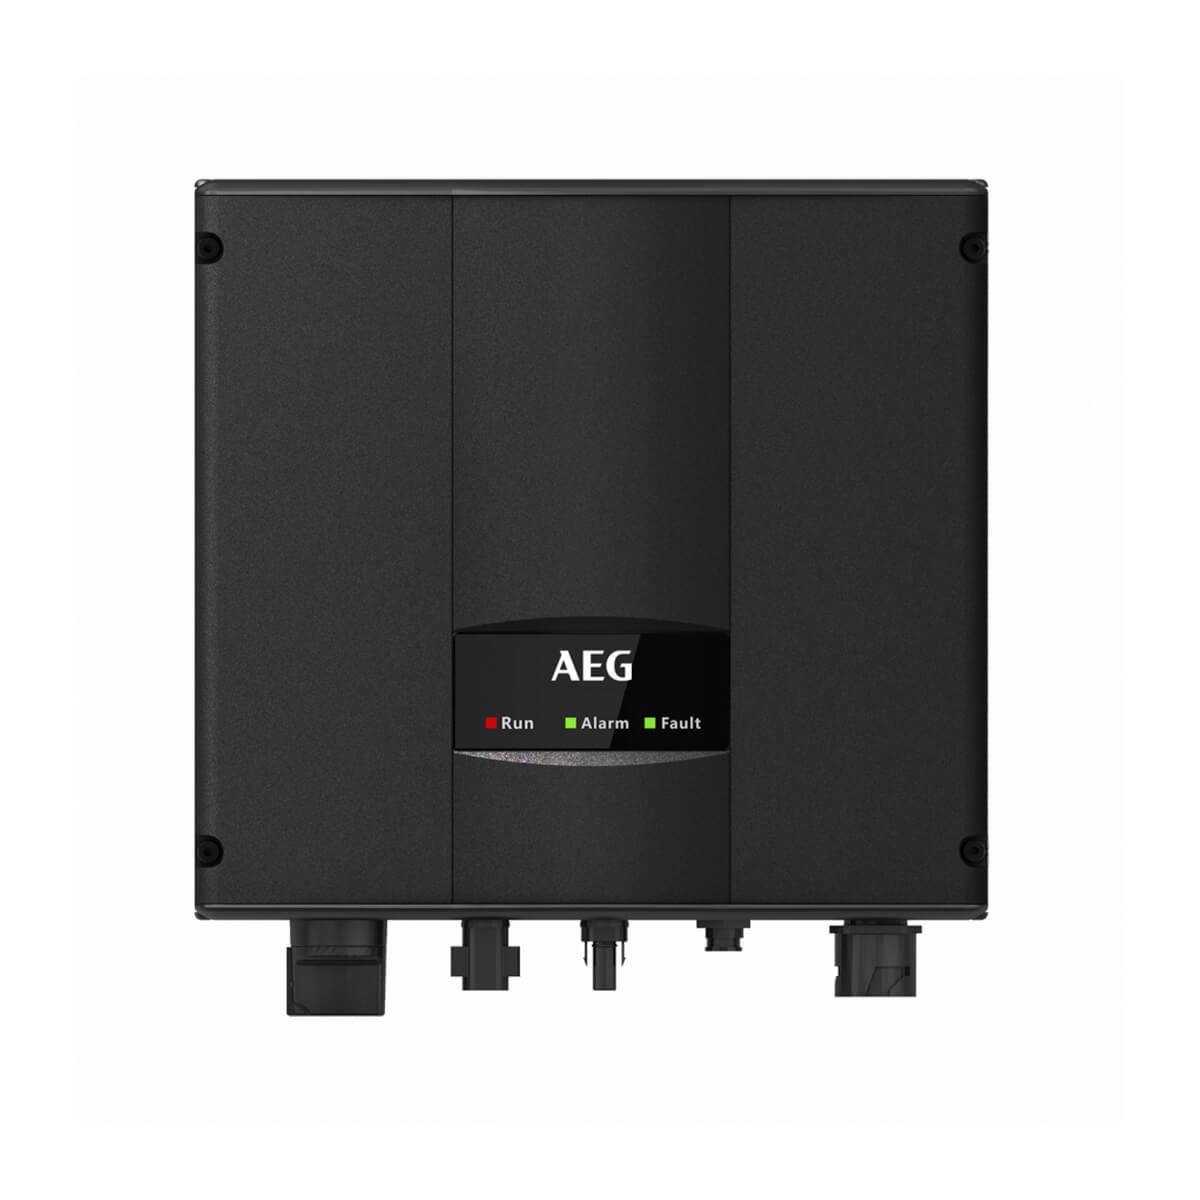 aeg 3kW inverter, aeg as-ir01 3kW inverter, aeg as-ir01-3000 inverter, aeg as-ir01-3000, aeg as-ir01 3kW